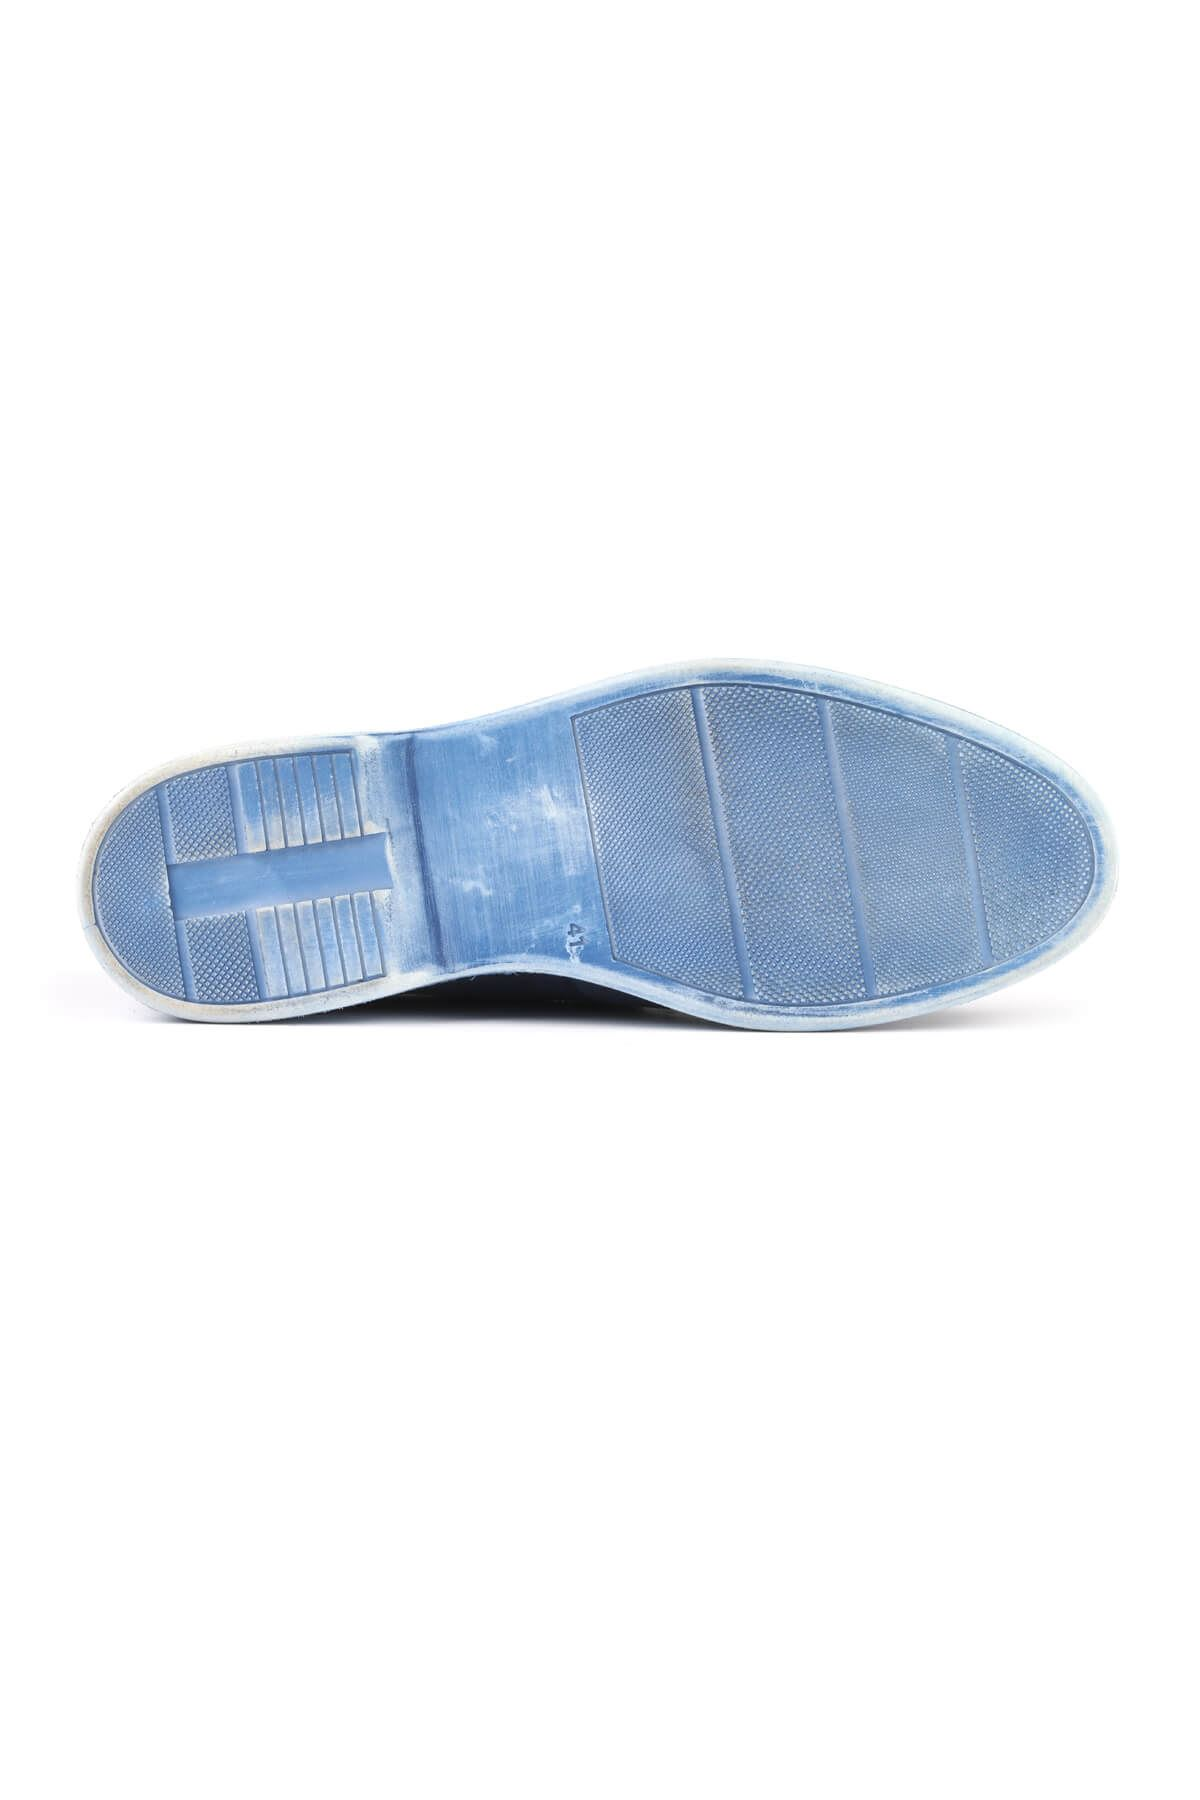 Libero 3004 Lacivert Loafer Ayakkabı